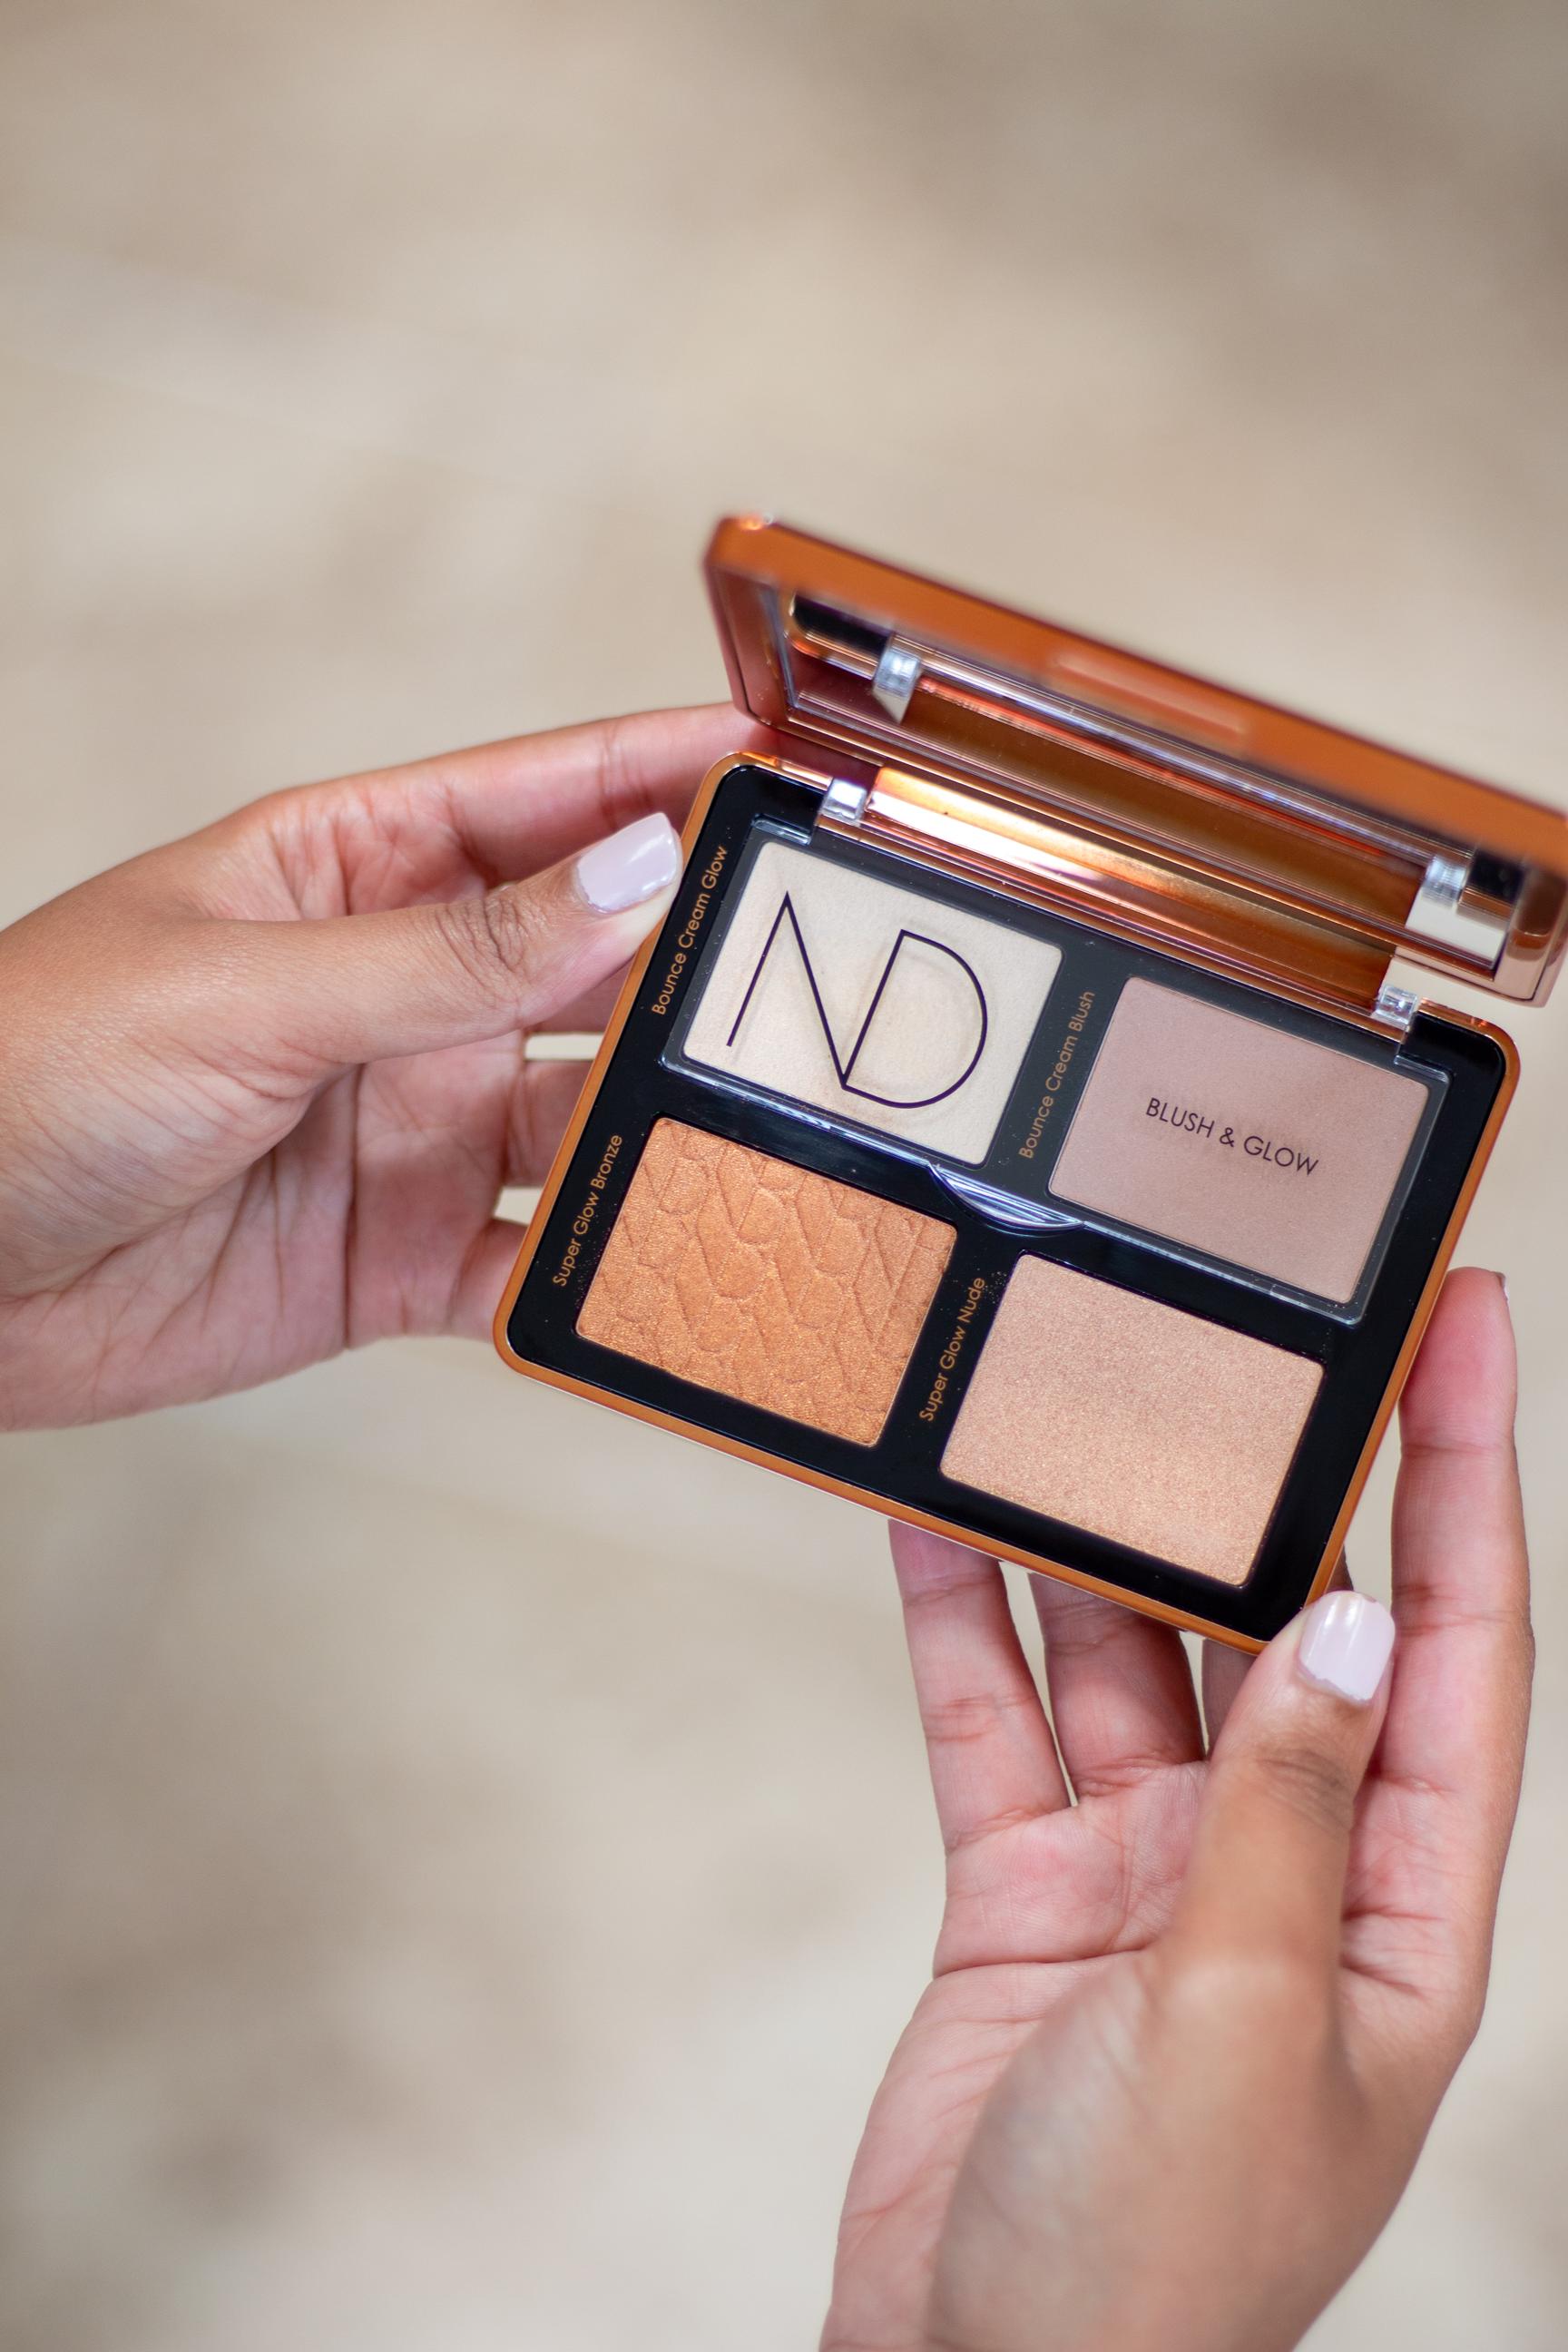 Natasha Denona Bronze Cheek Face Glow Palette Review